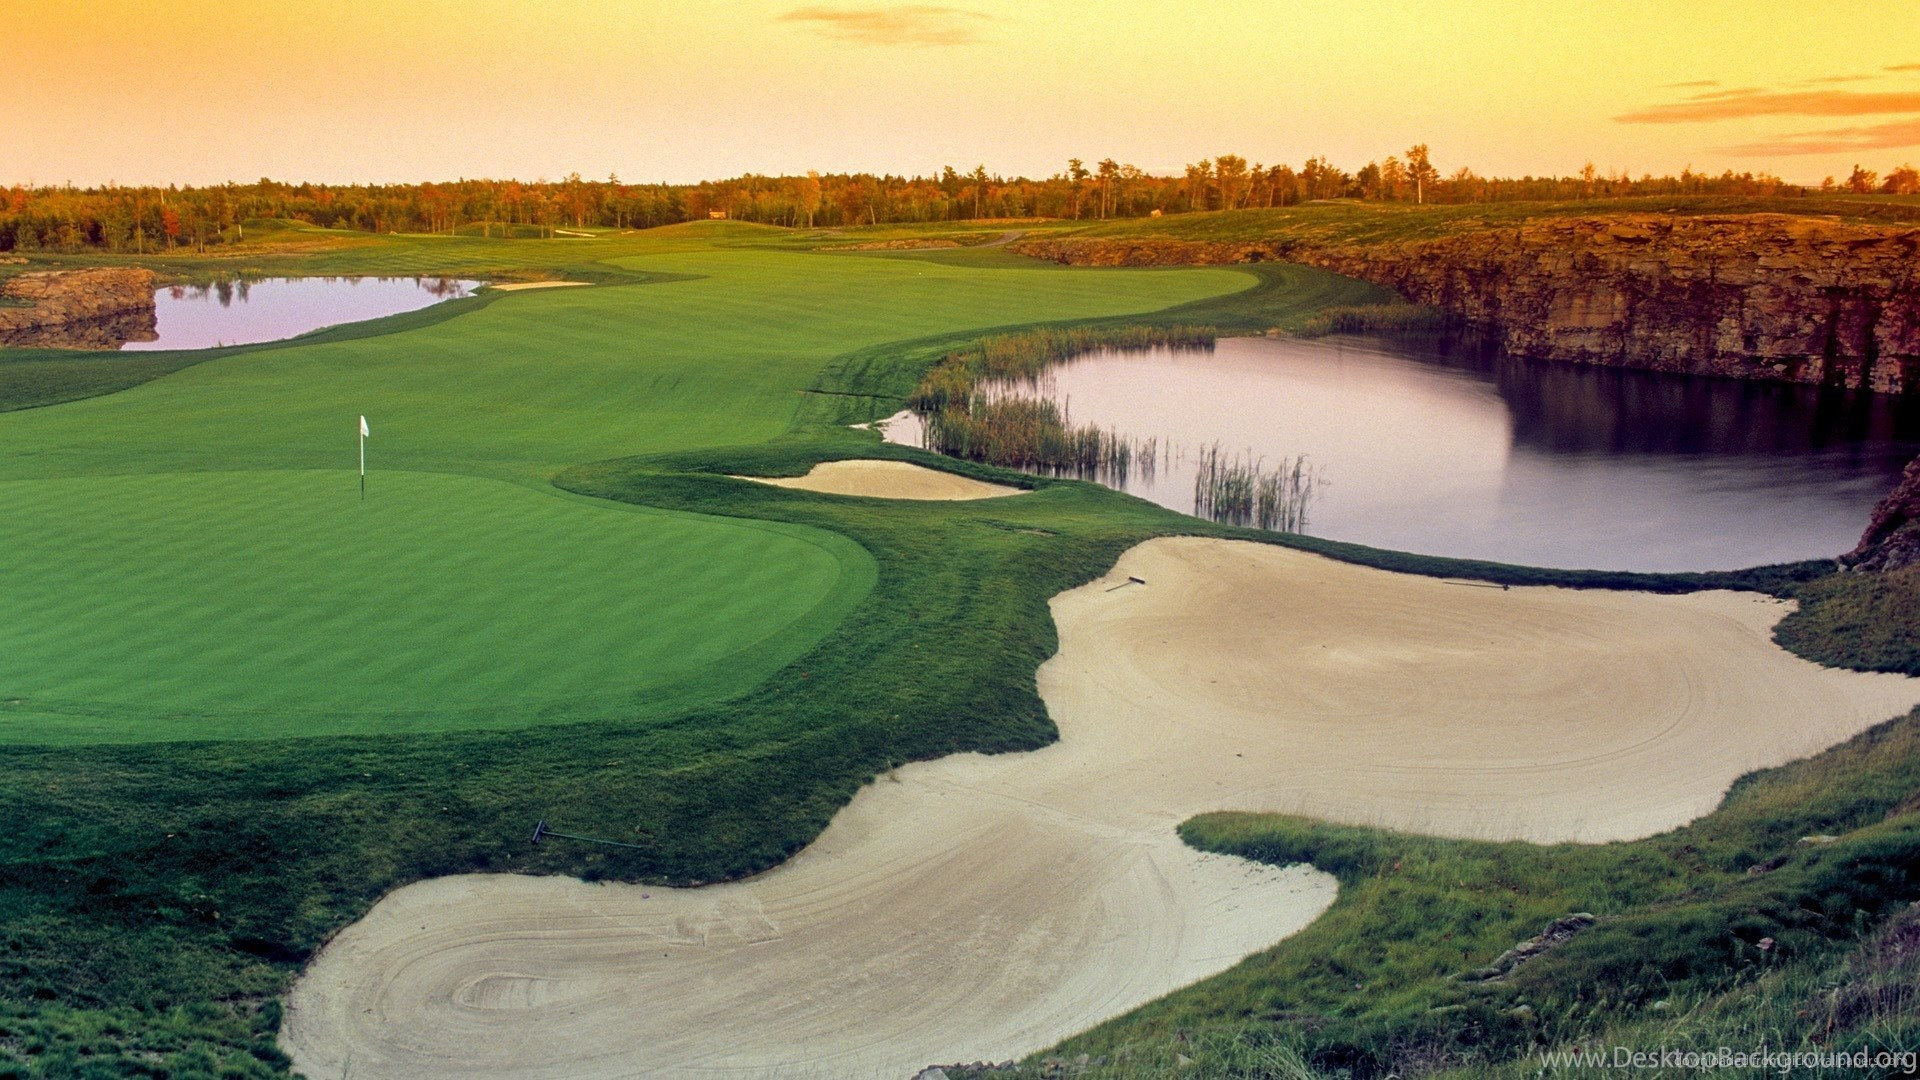 Golf Course Wallpapers 1920x1080 Desktop Background